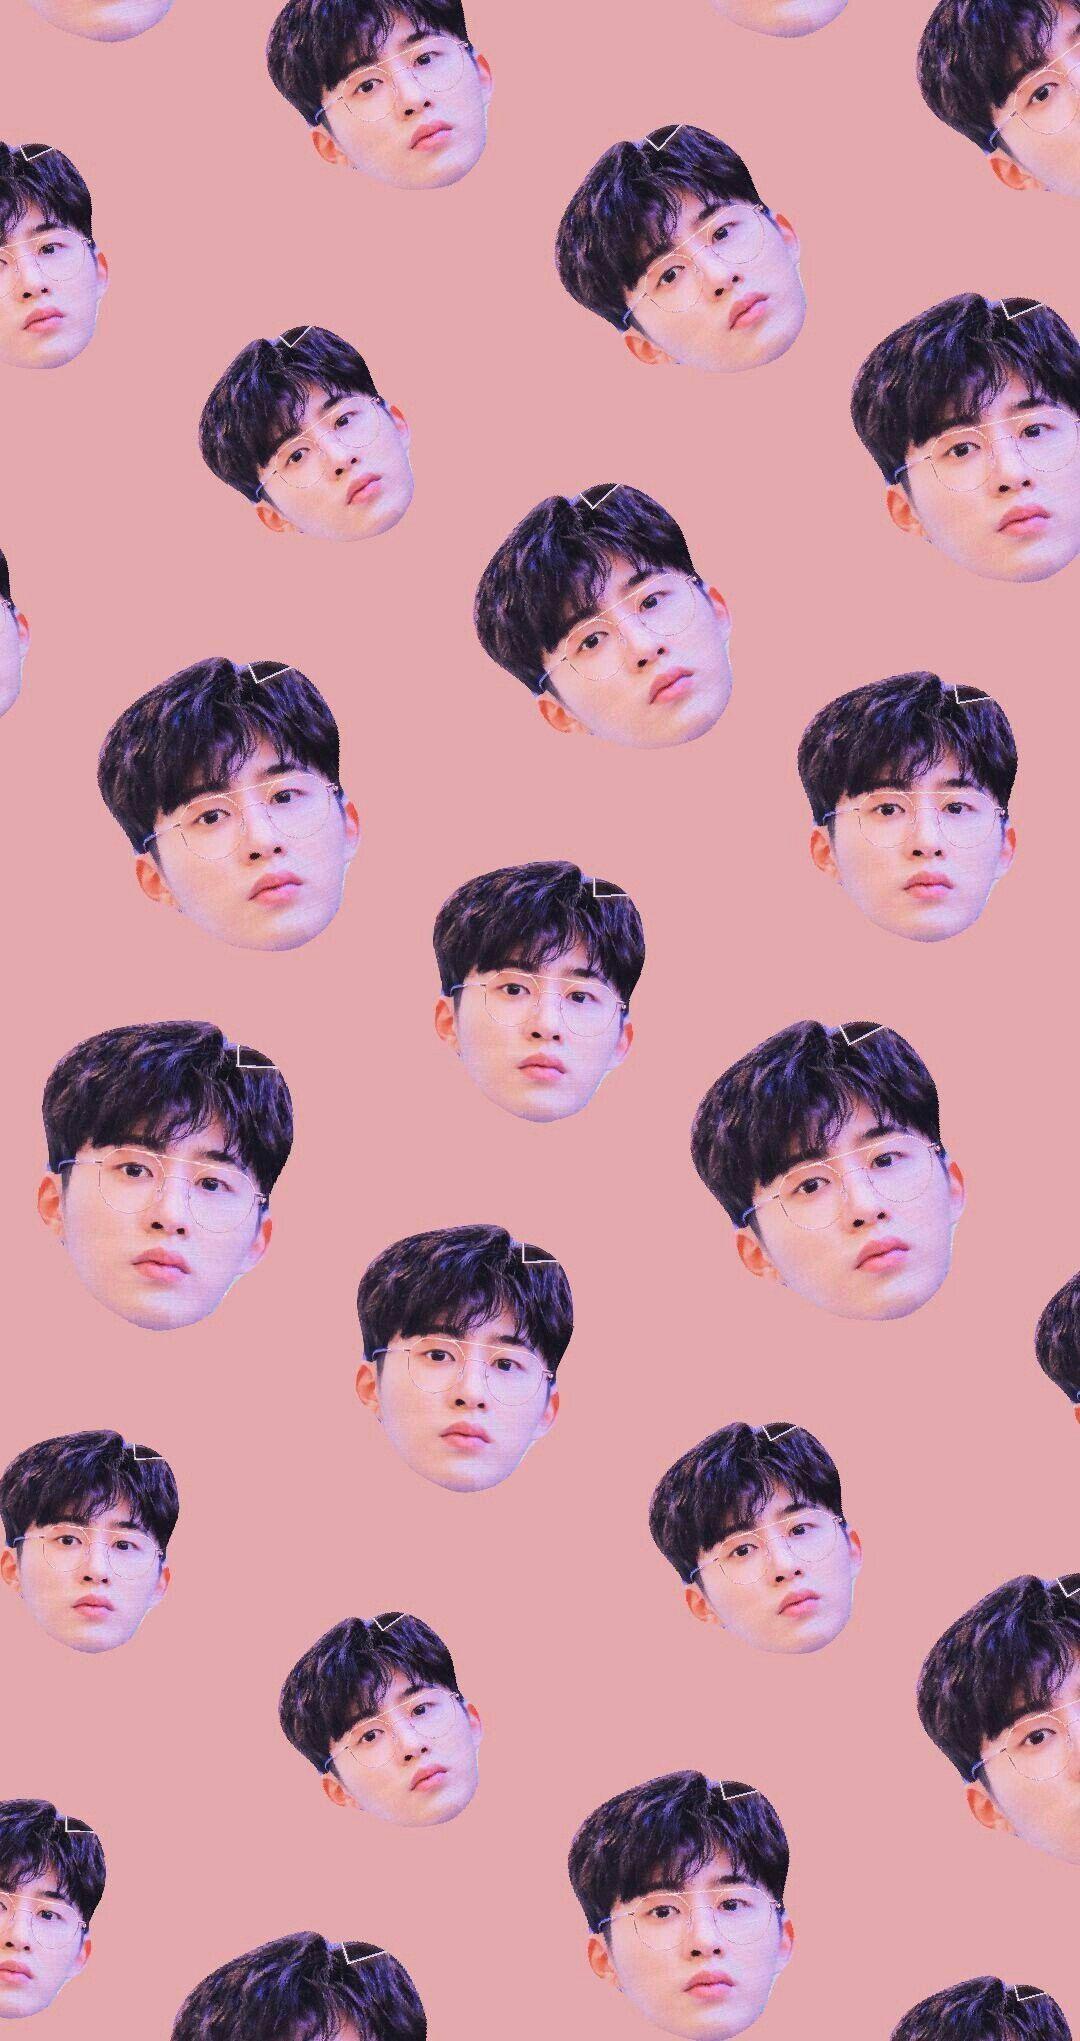 Iko7ony On Twitter Wallpaper Ponsel Gambar Artis Aesthetic ikon hanbin wallpaper